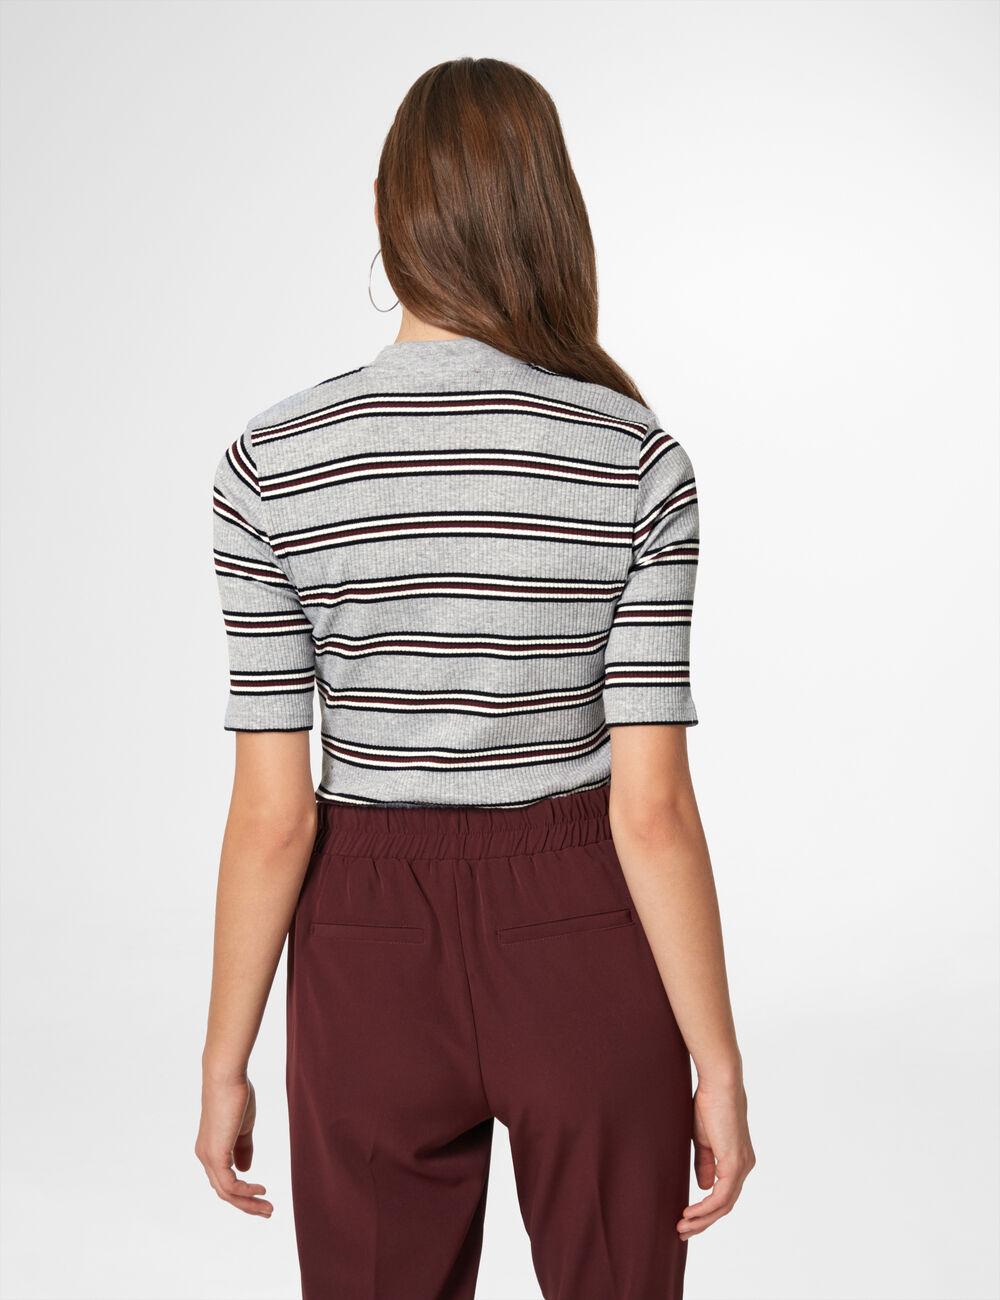 tee shirt c tel ray gris noir blanc et prune femme. Black Bedroom Furniture Sets. Home Design Ideas